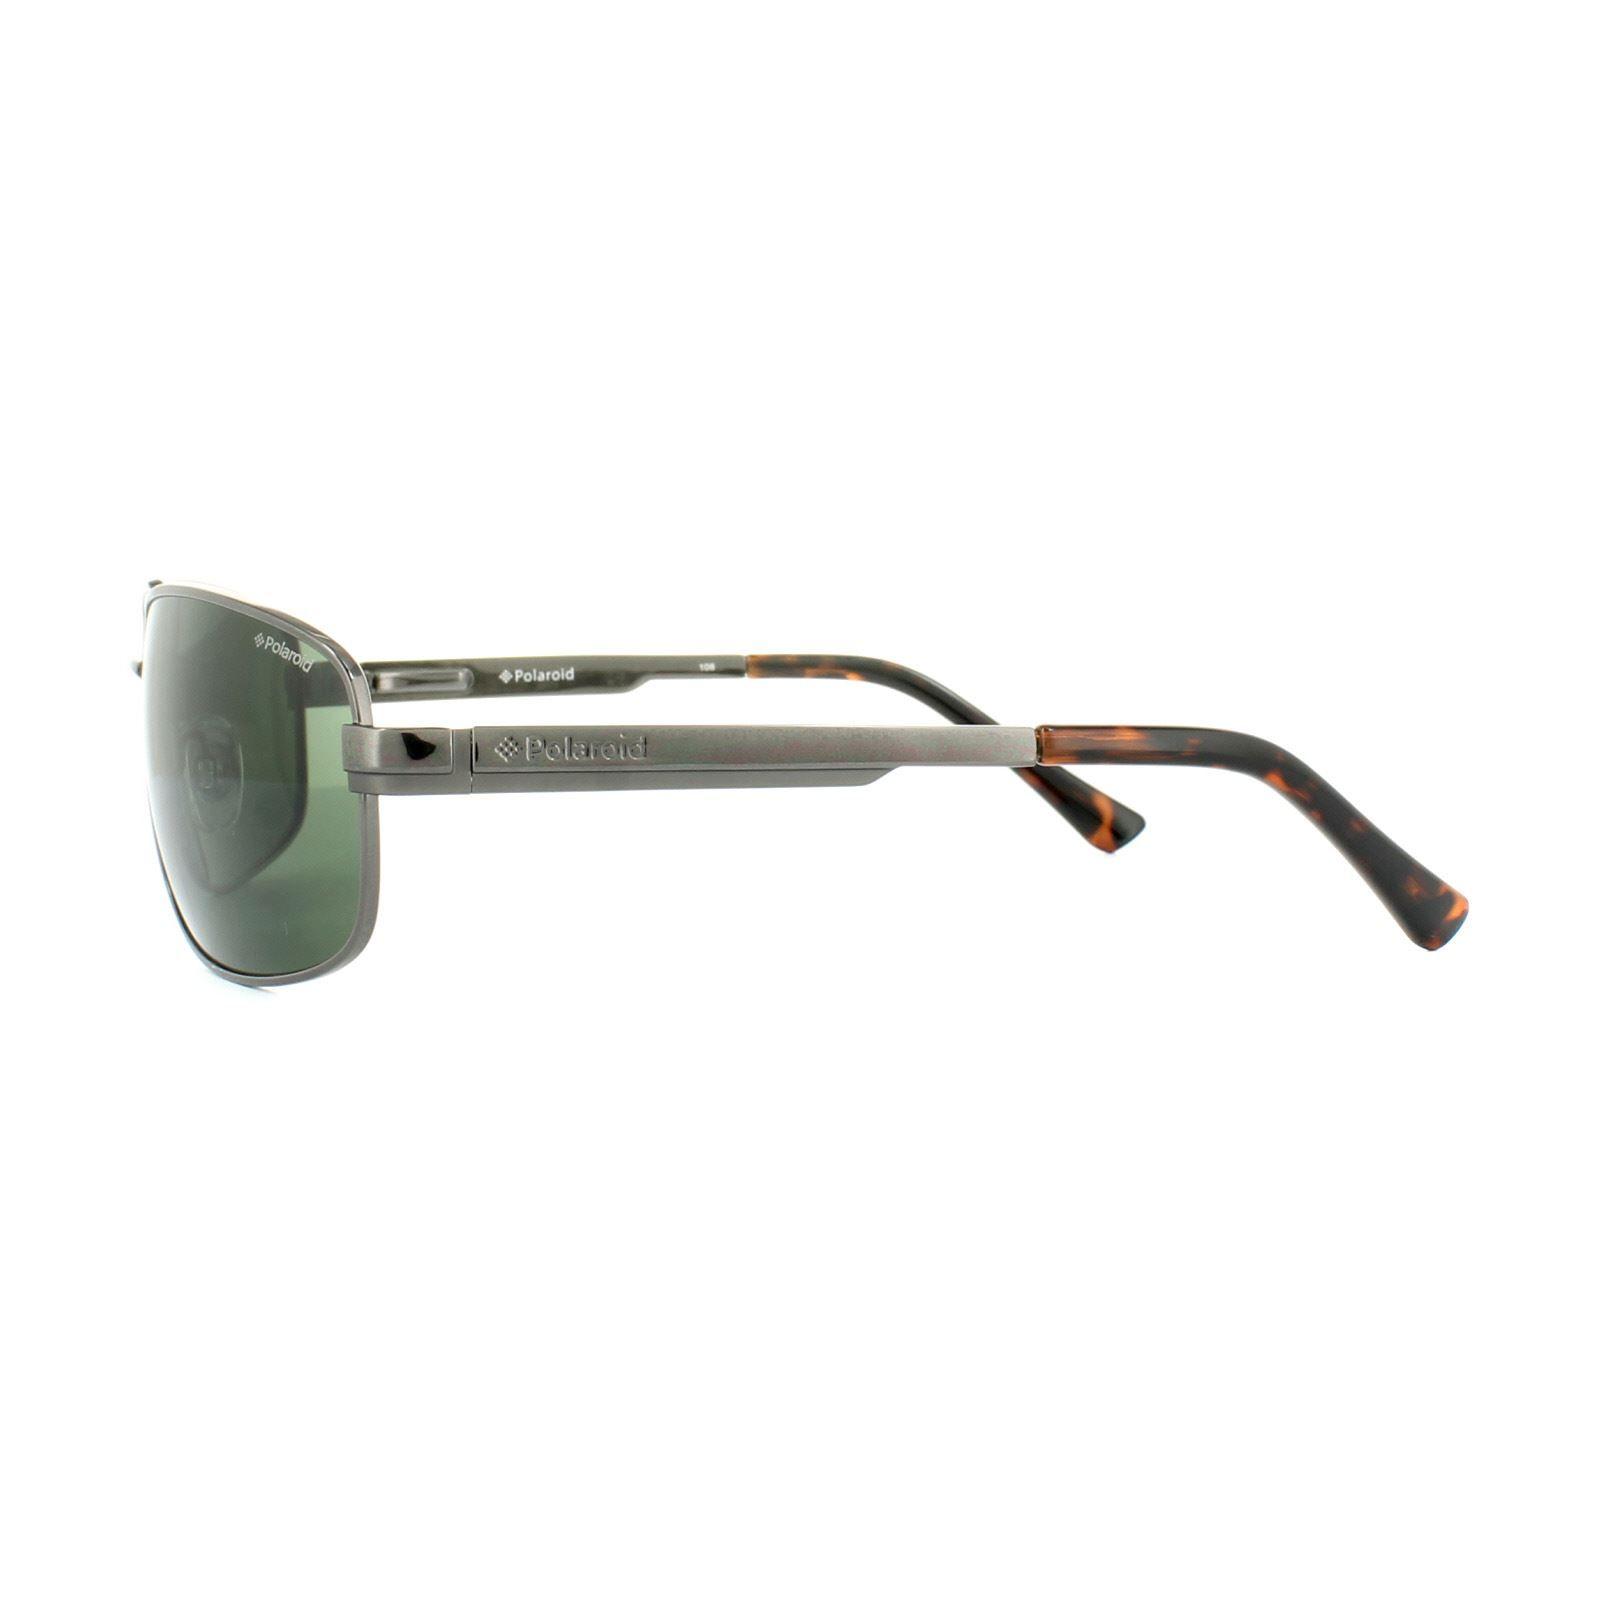 Polaroid Sunglasses P4314 KIH RC Black Green Polarized